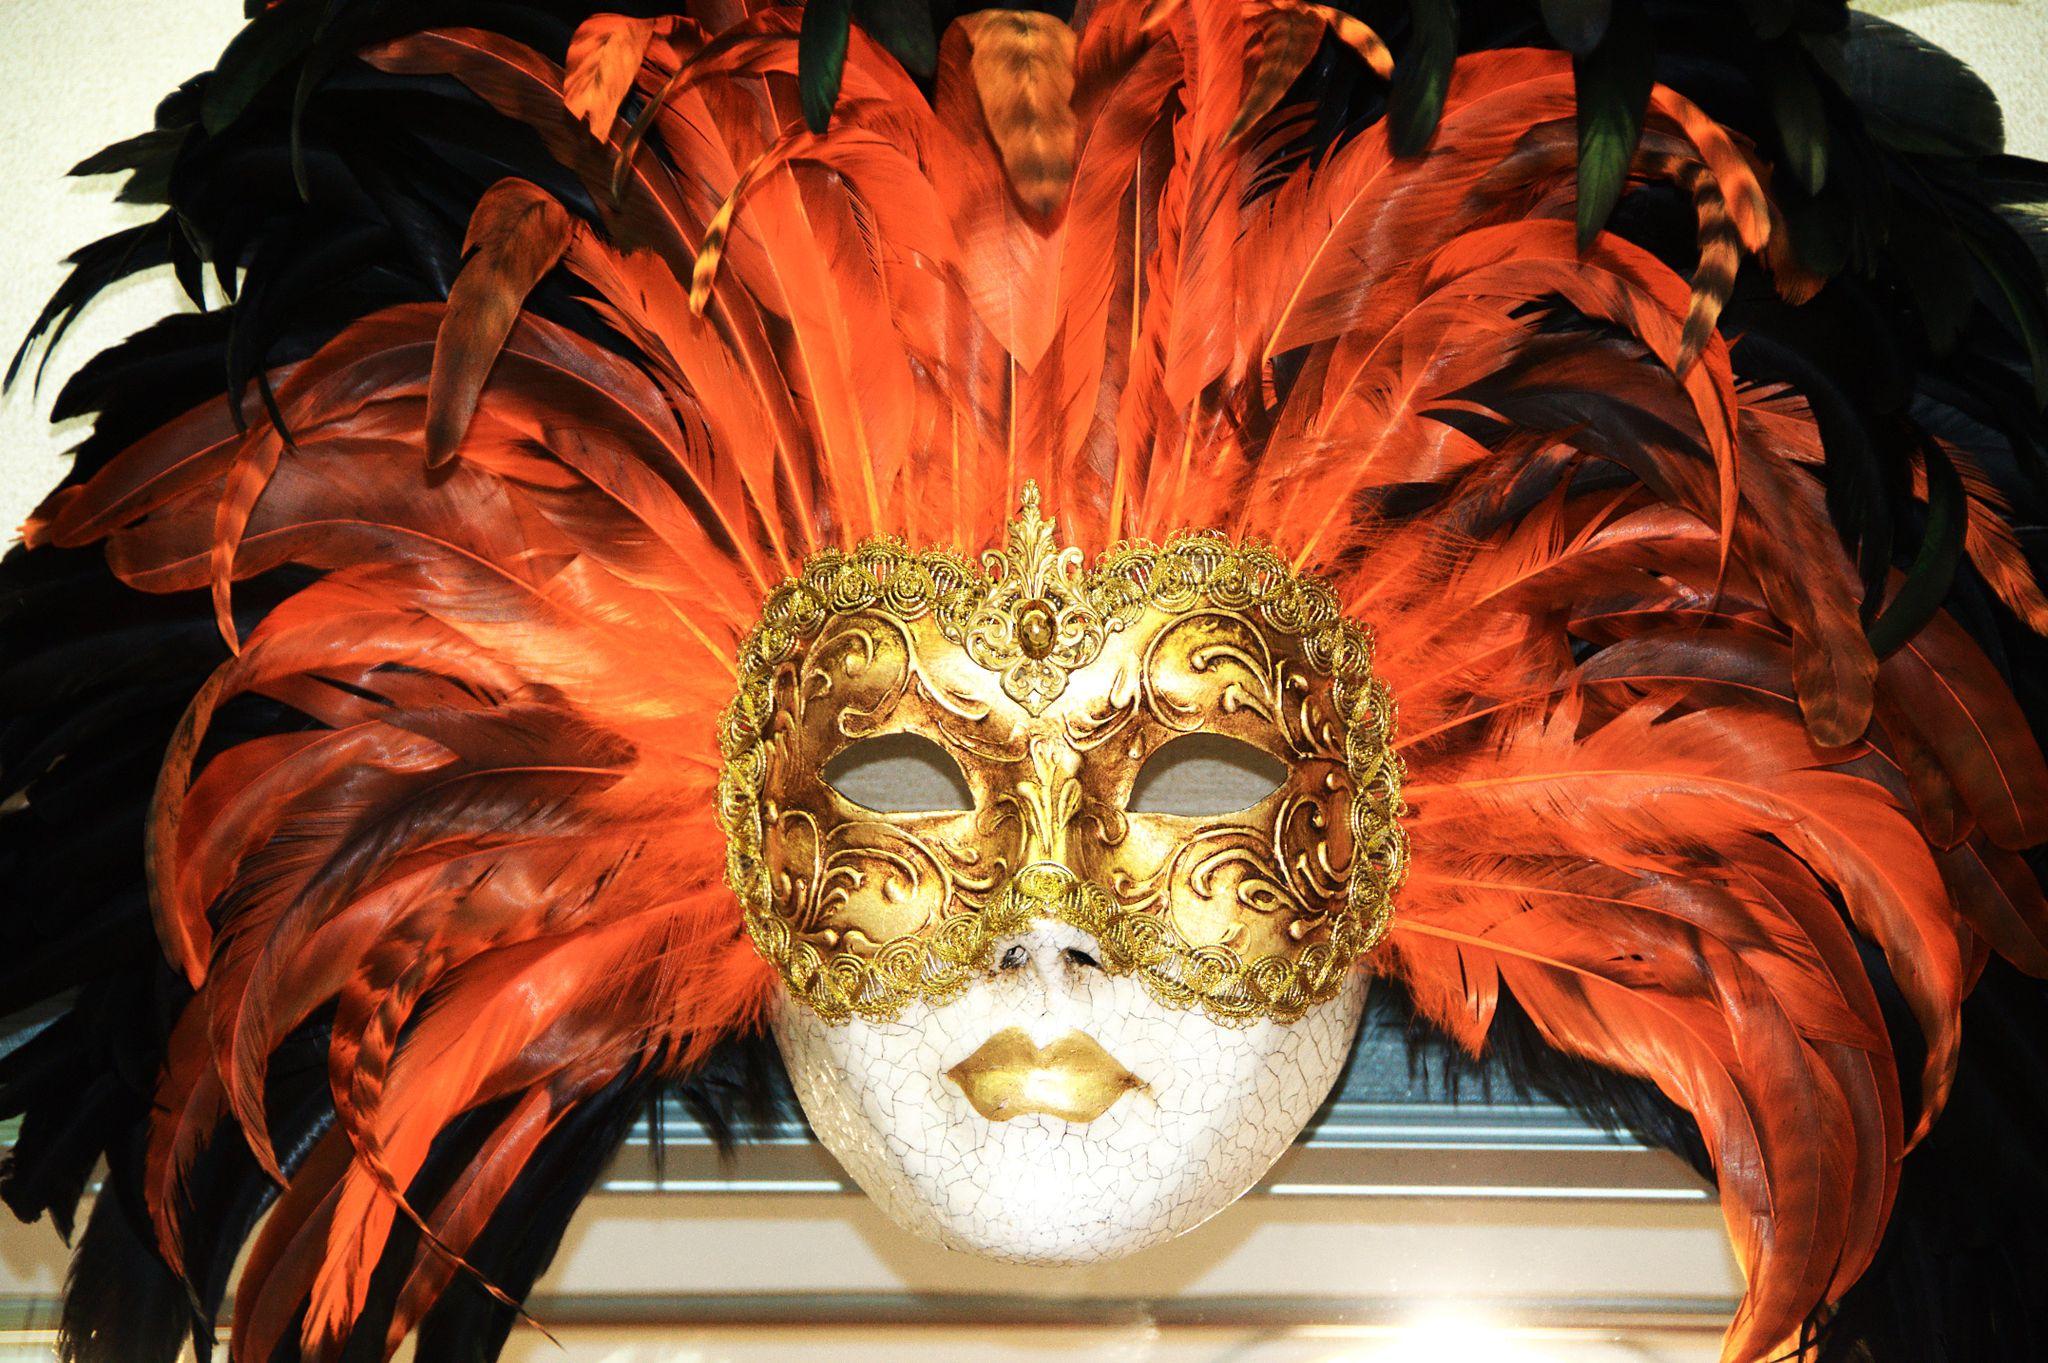 Dissimulation an italian tradition searching for bernini - Mascaras de carnaval de venecia ...